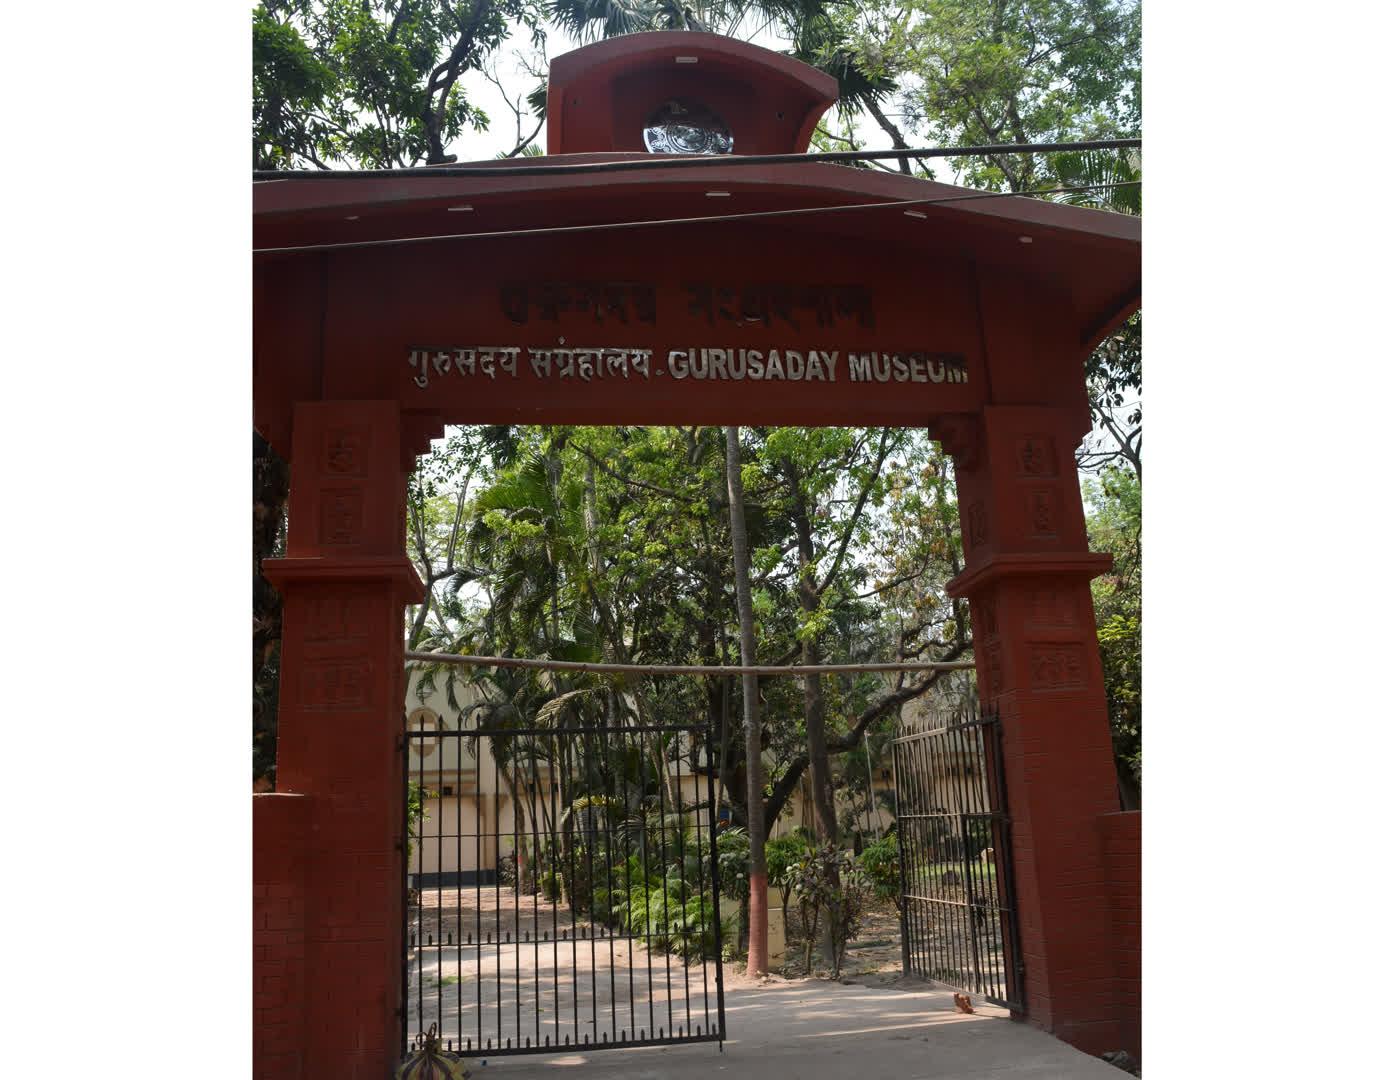 Entrance to the Gurusaday Museum in Joka   Gurusaday Museum